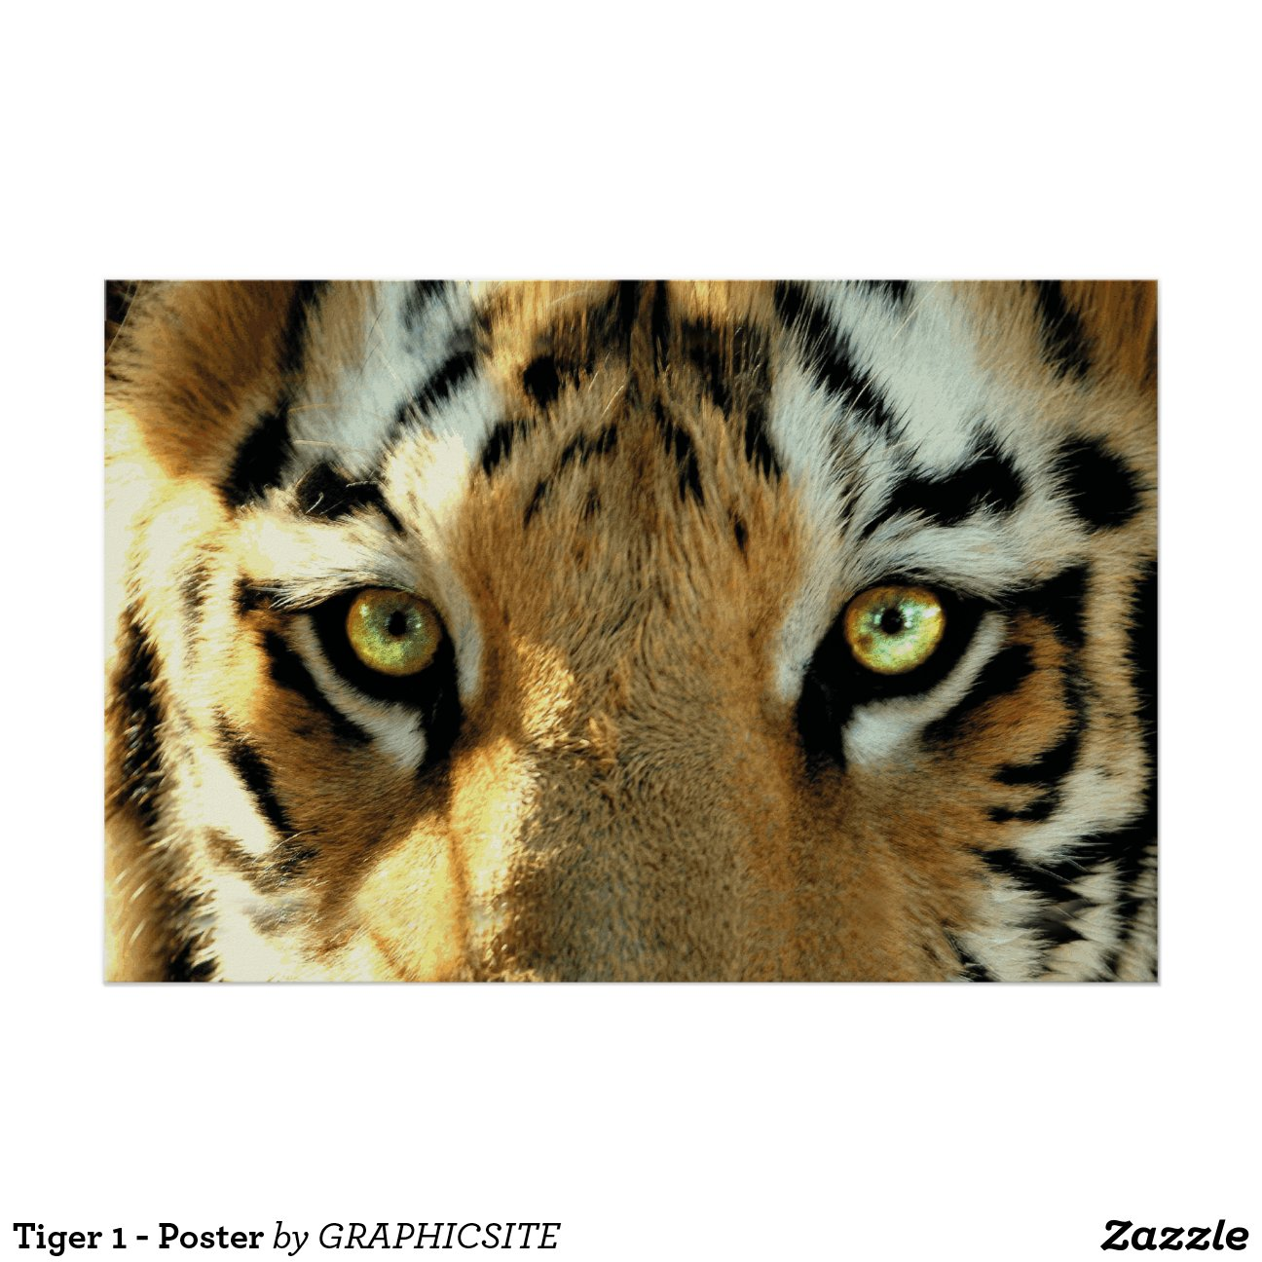 Tiger 1 - Poster Zazzle